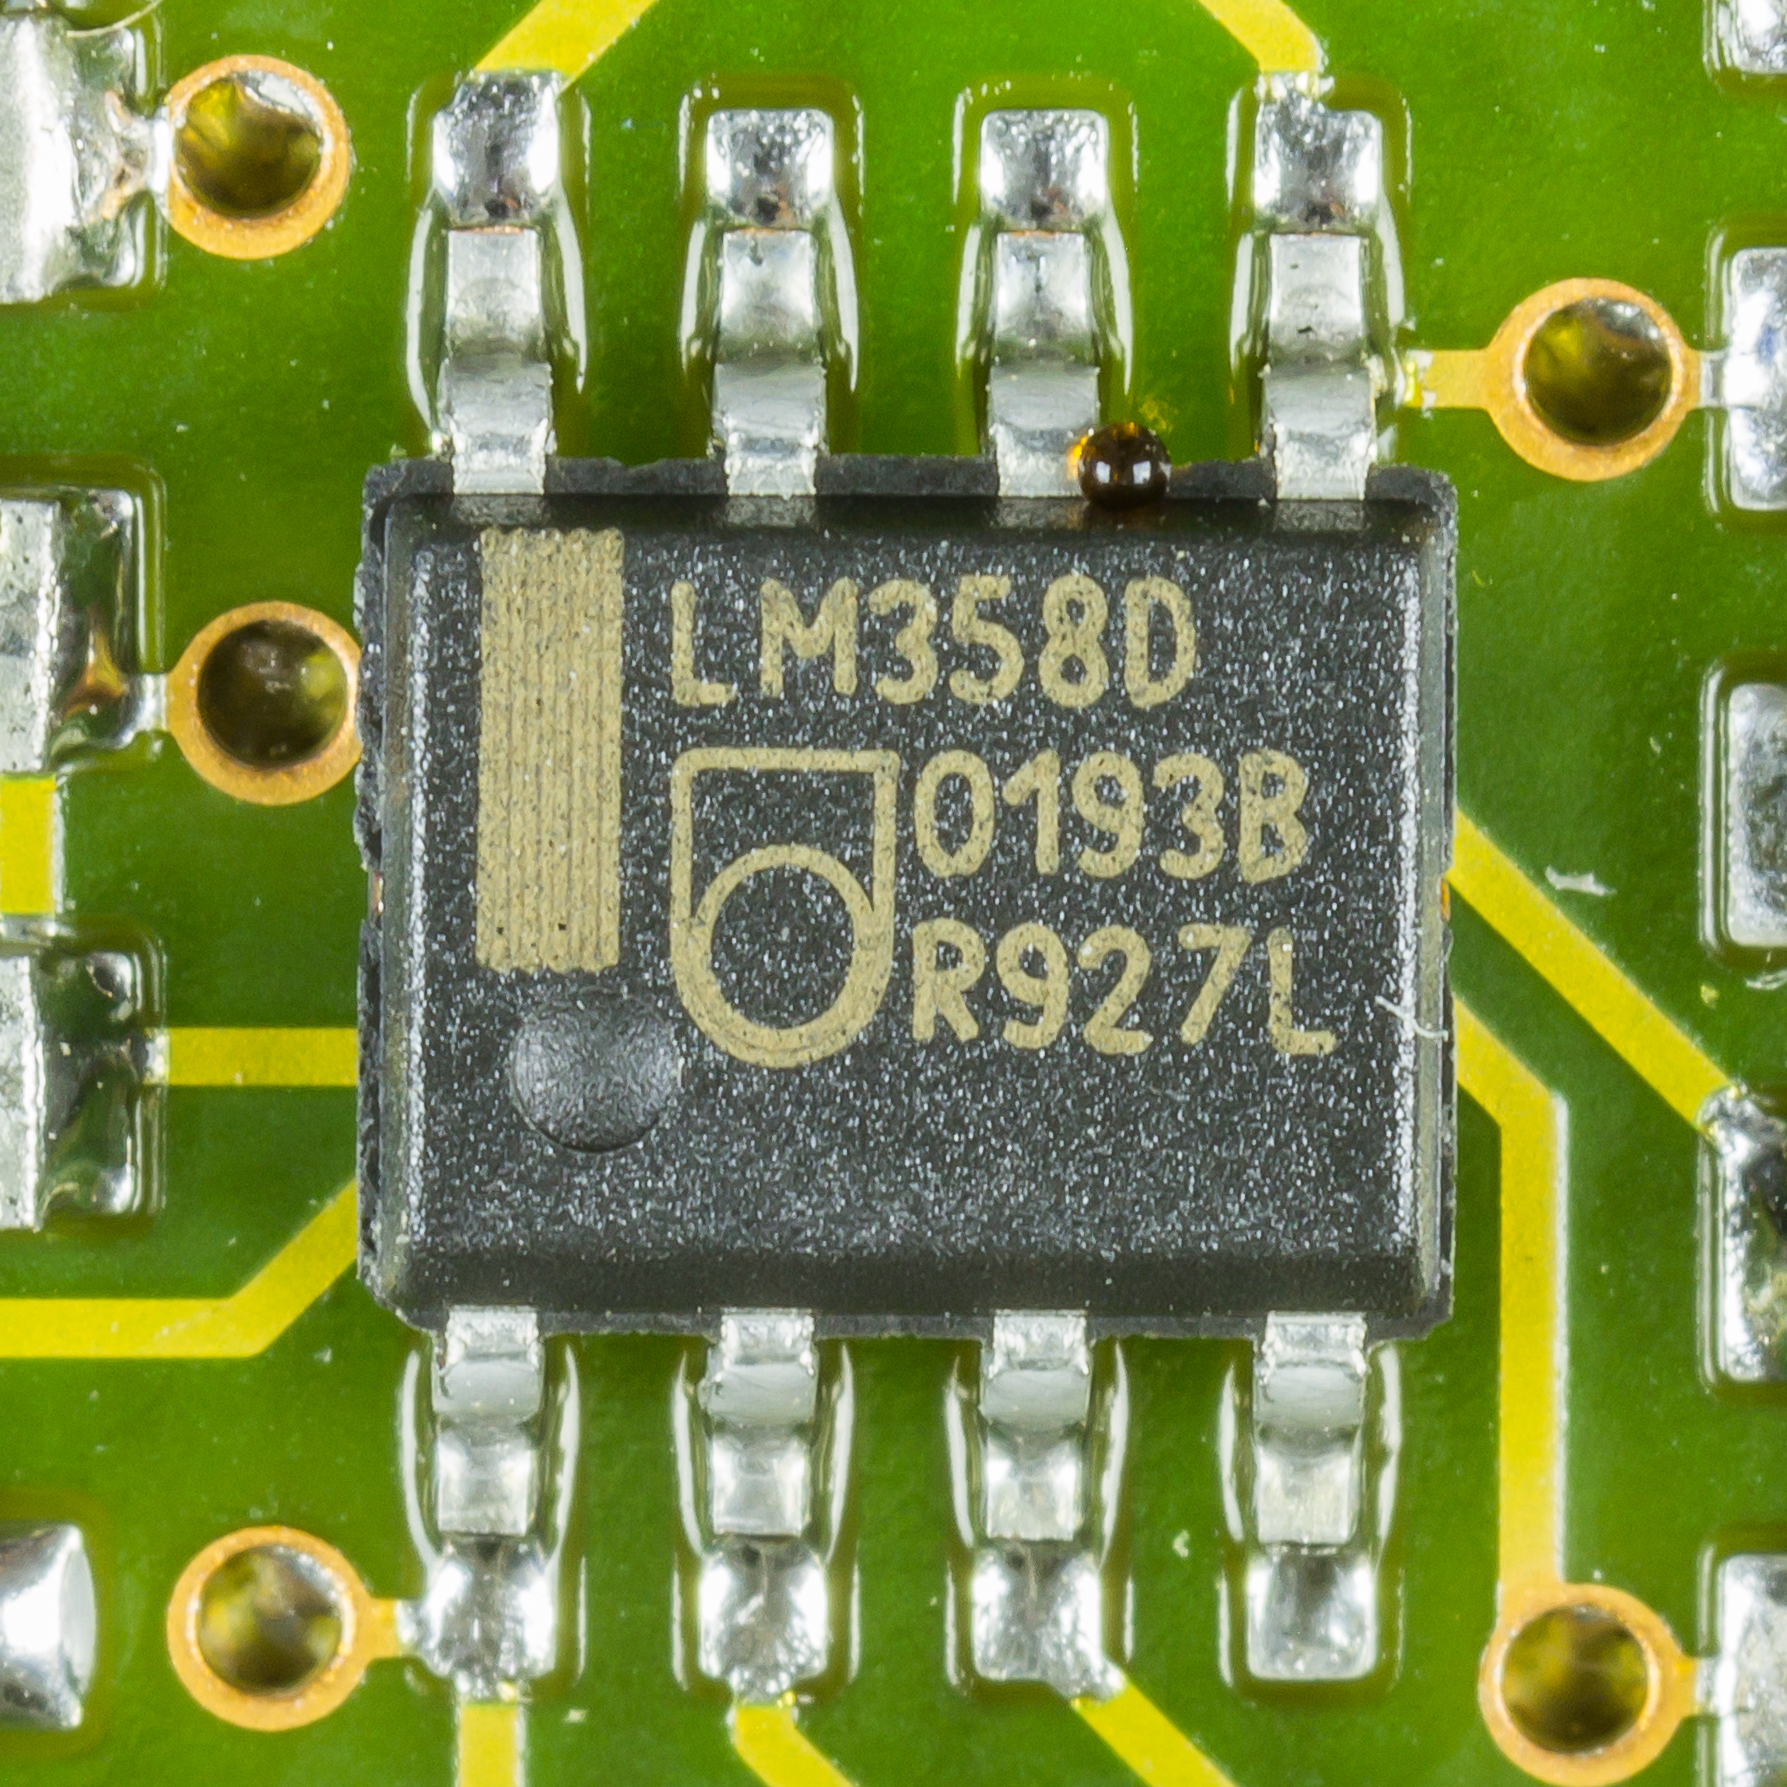 LM358 - Wikipedia